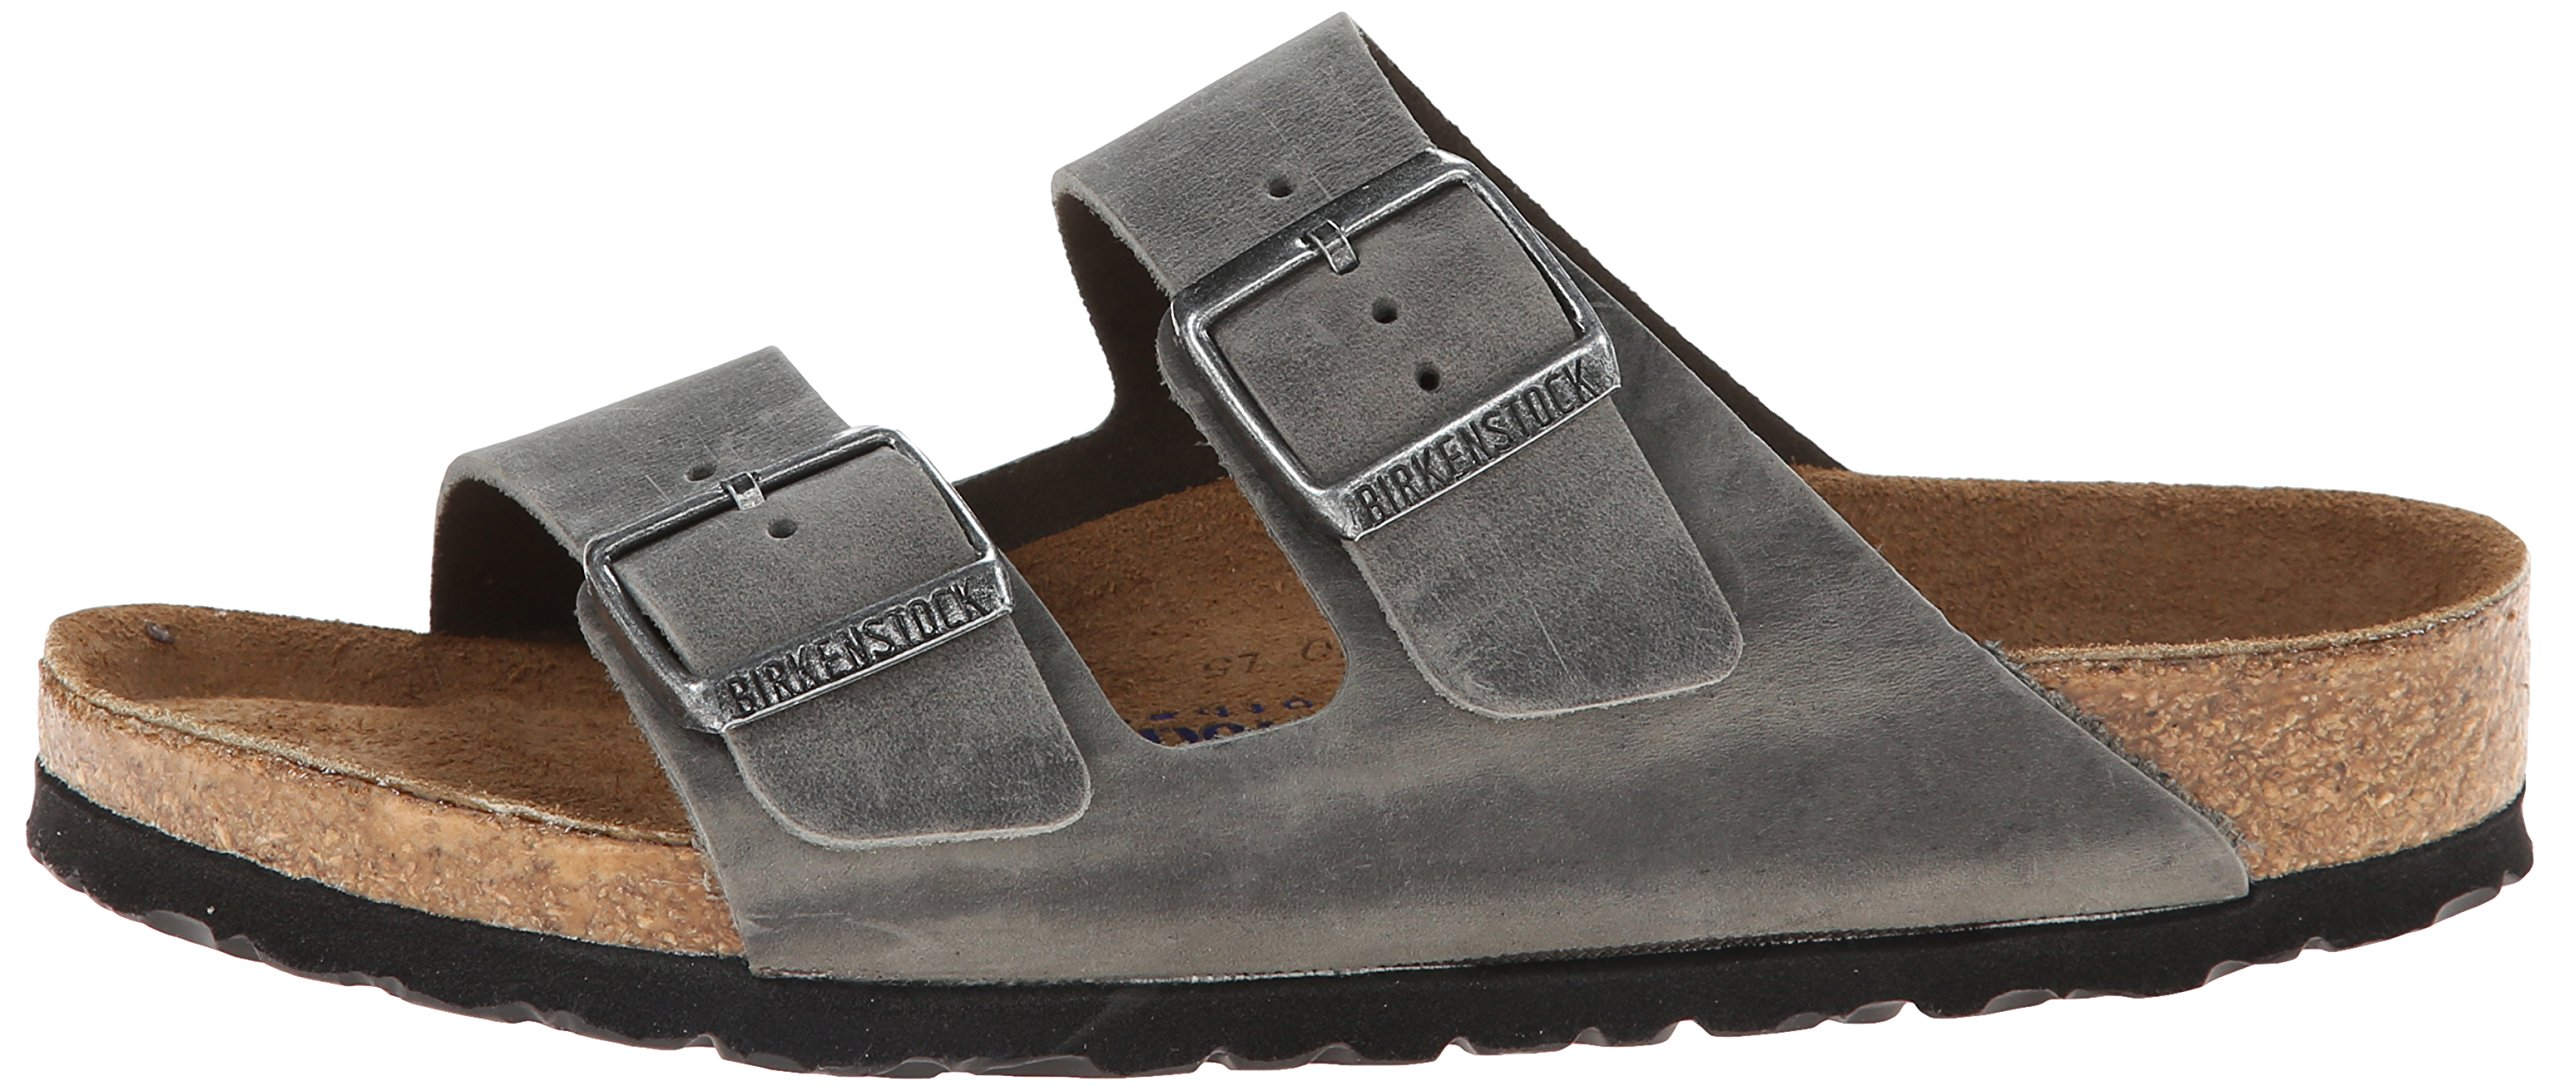 Birkenstock Unisex Arizona Iron Oiled Leather Sandals - 45 M EU/12-12.5 B(M) US Men by Birkenstock (Image #5)